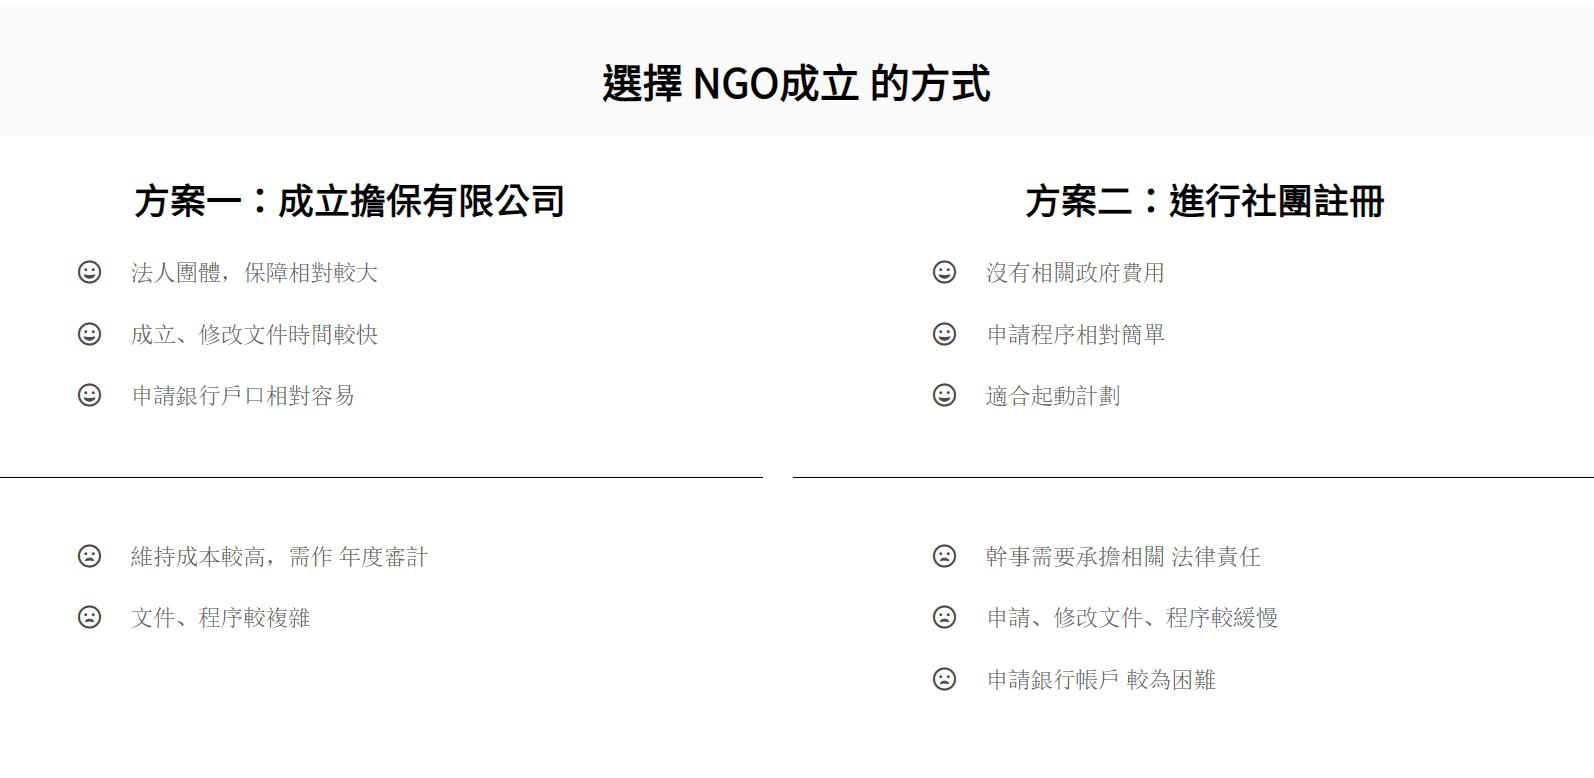 NGOHK-慈善團體-成立方式